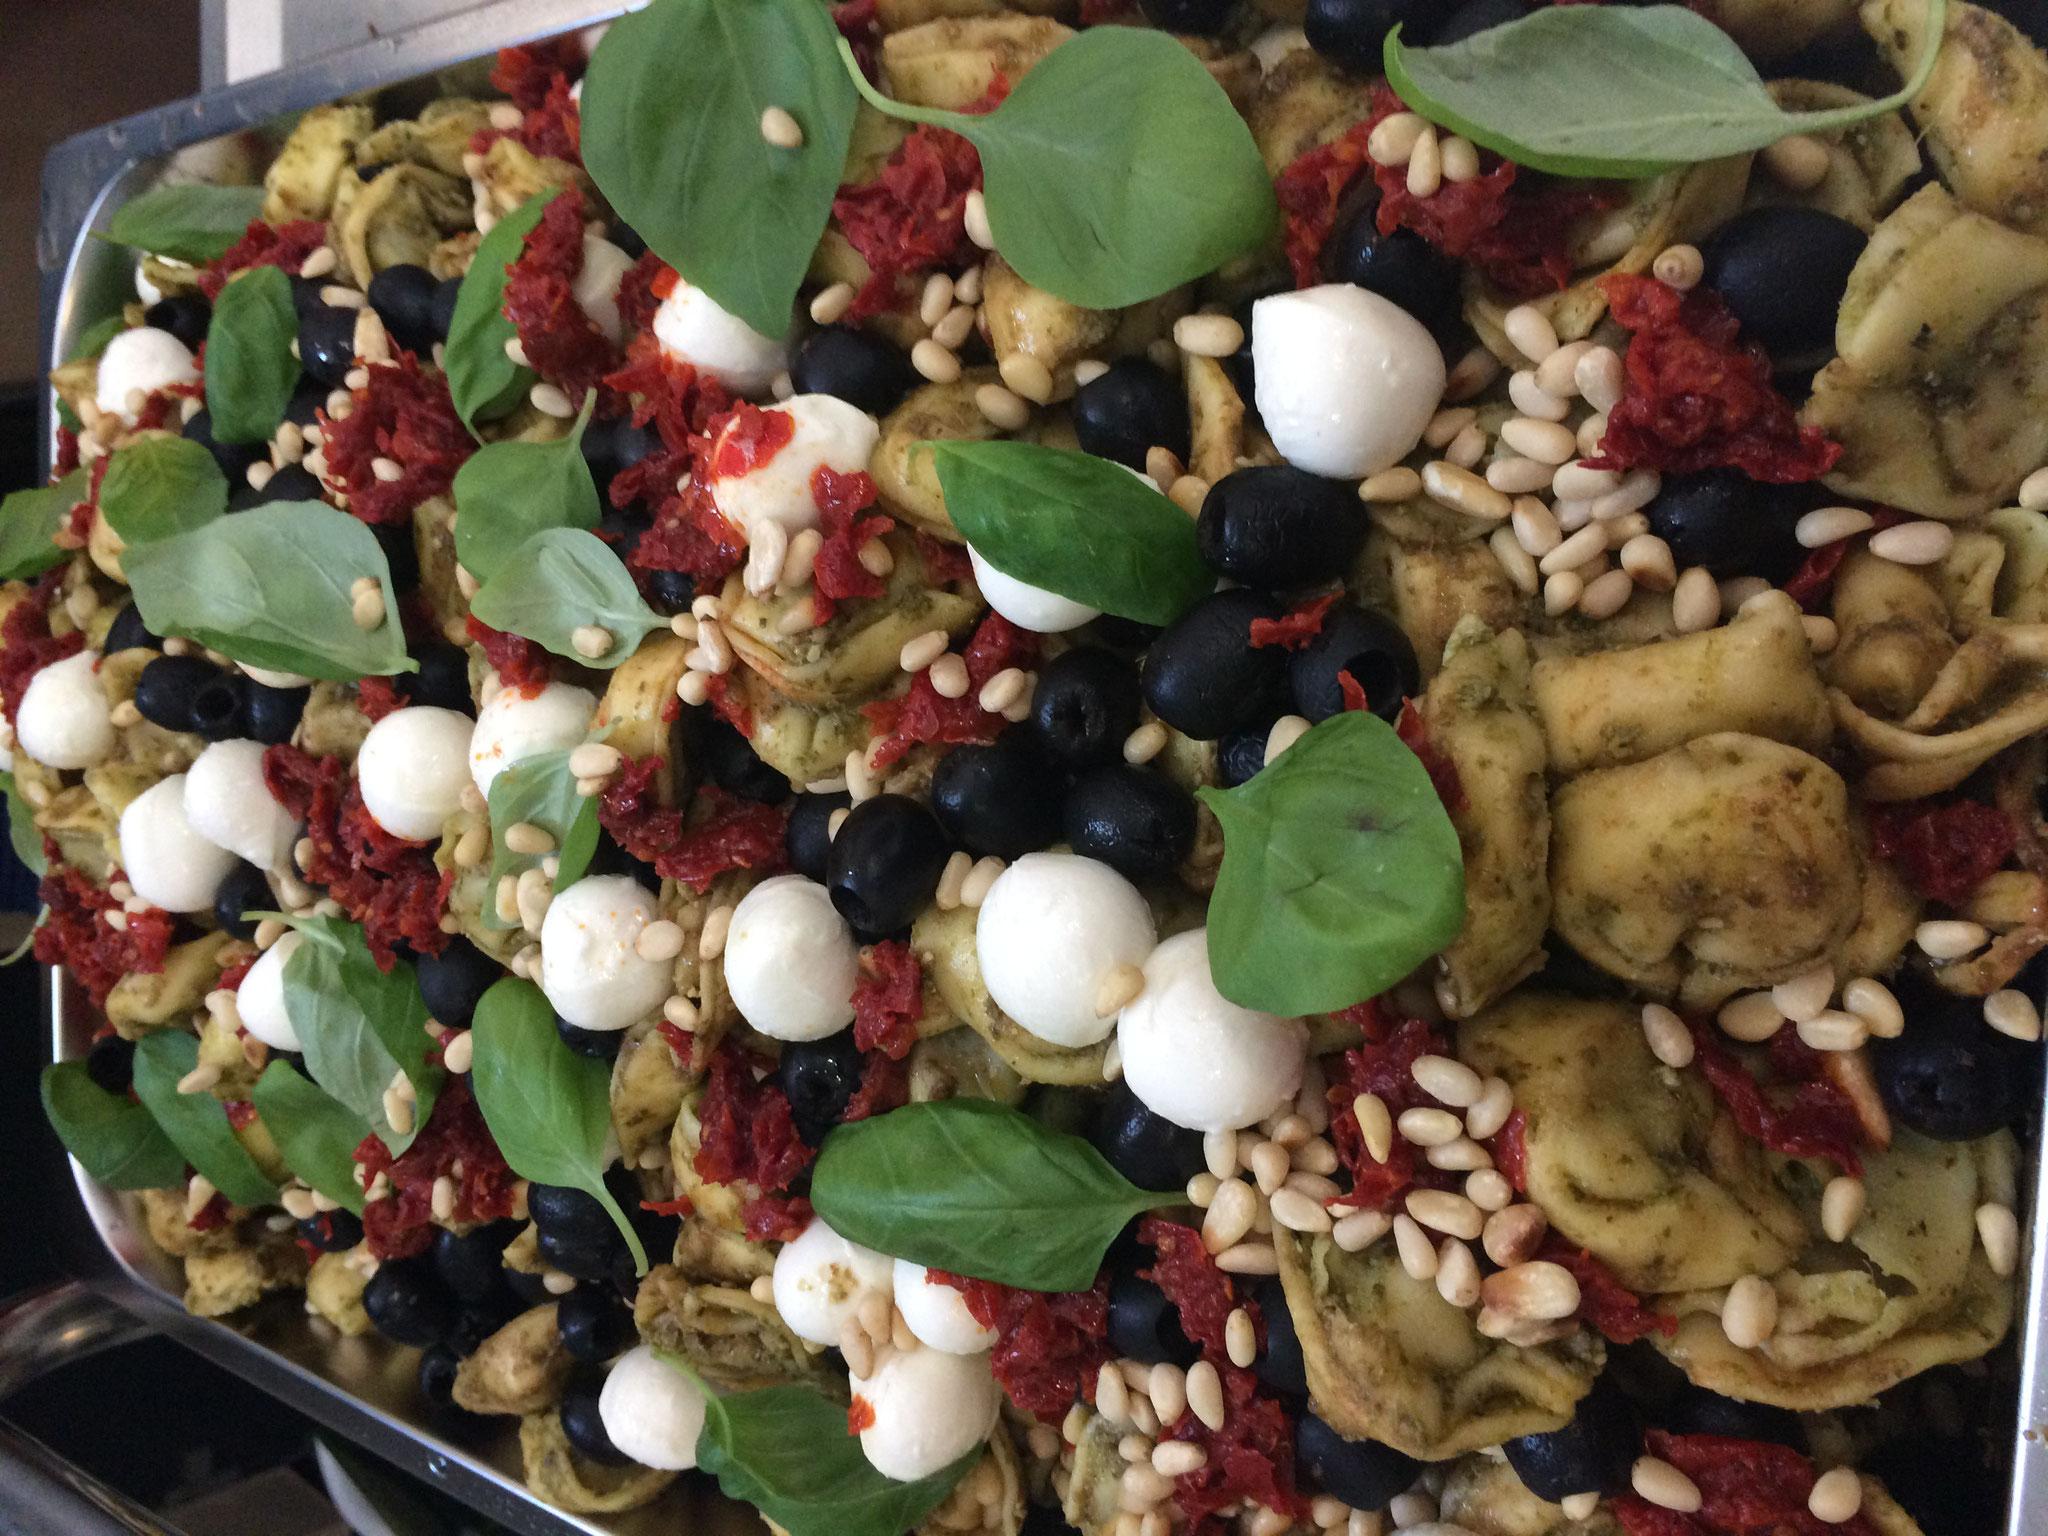 Tortellinisalat mit Pesto, Mozzarellakugeln, Oliven Tomaten, Pinienkerne und Basilikum